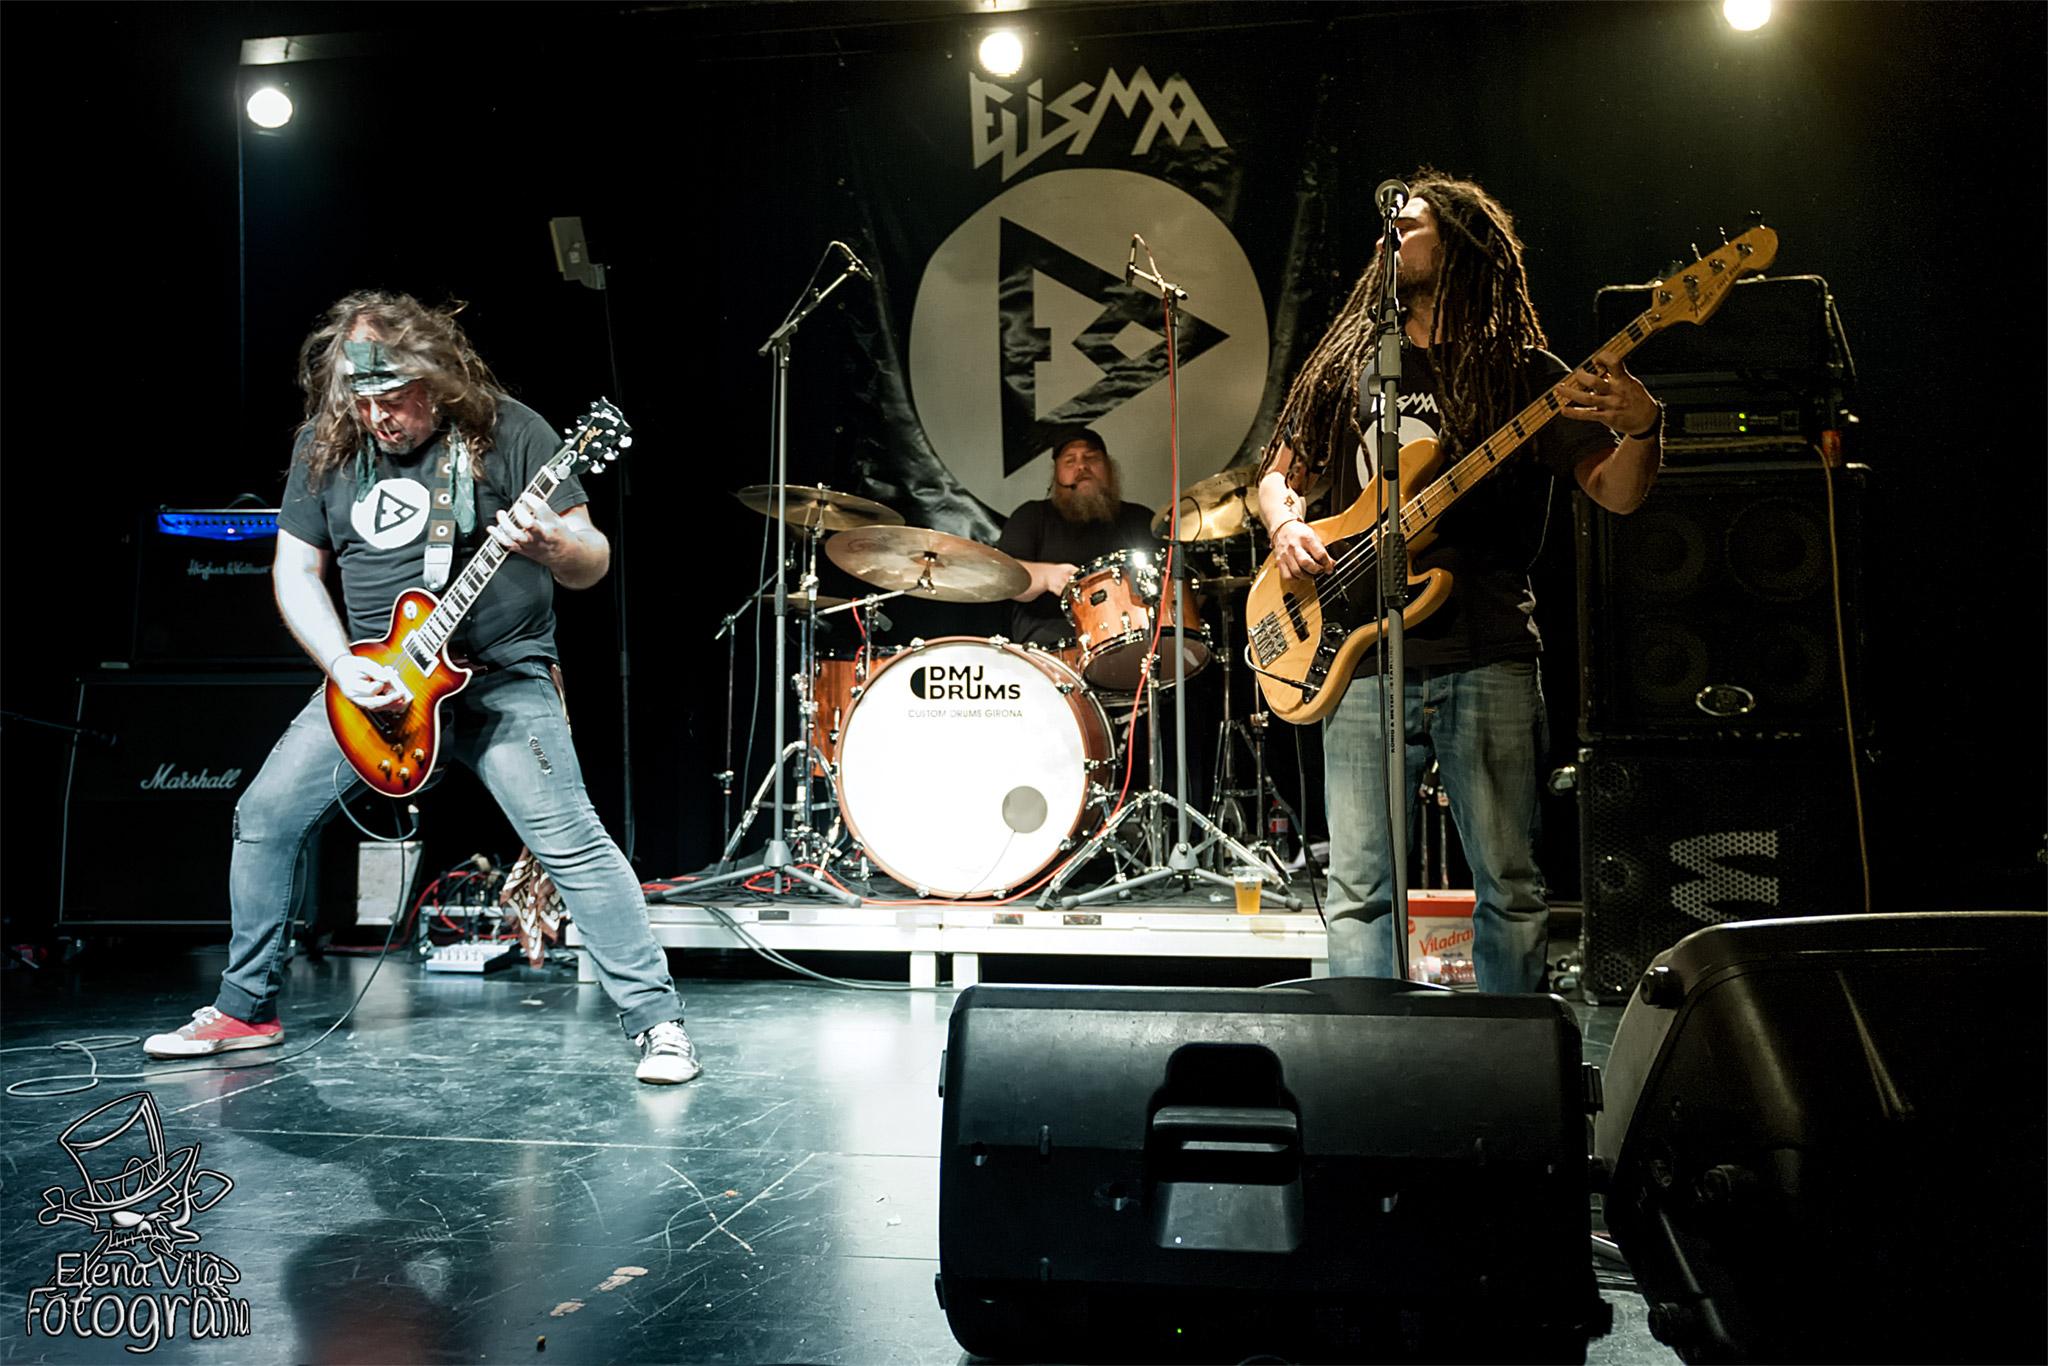 Elisma rock'n'civic 5